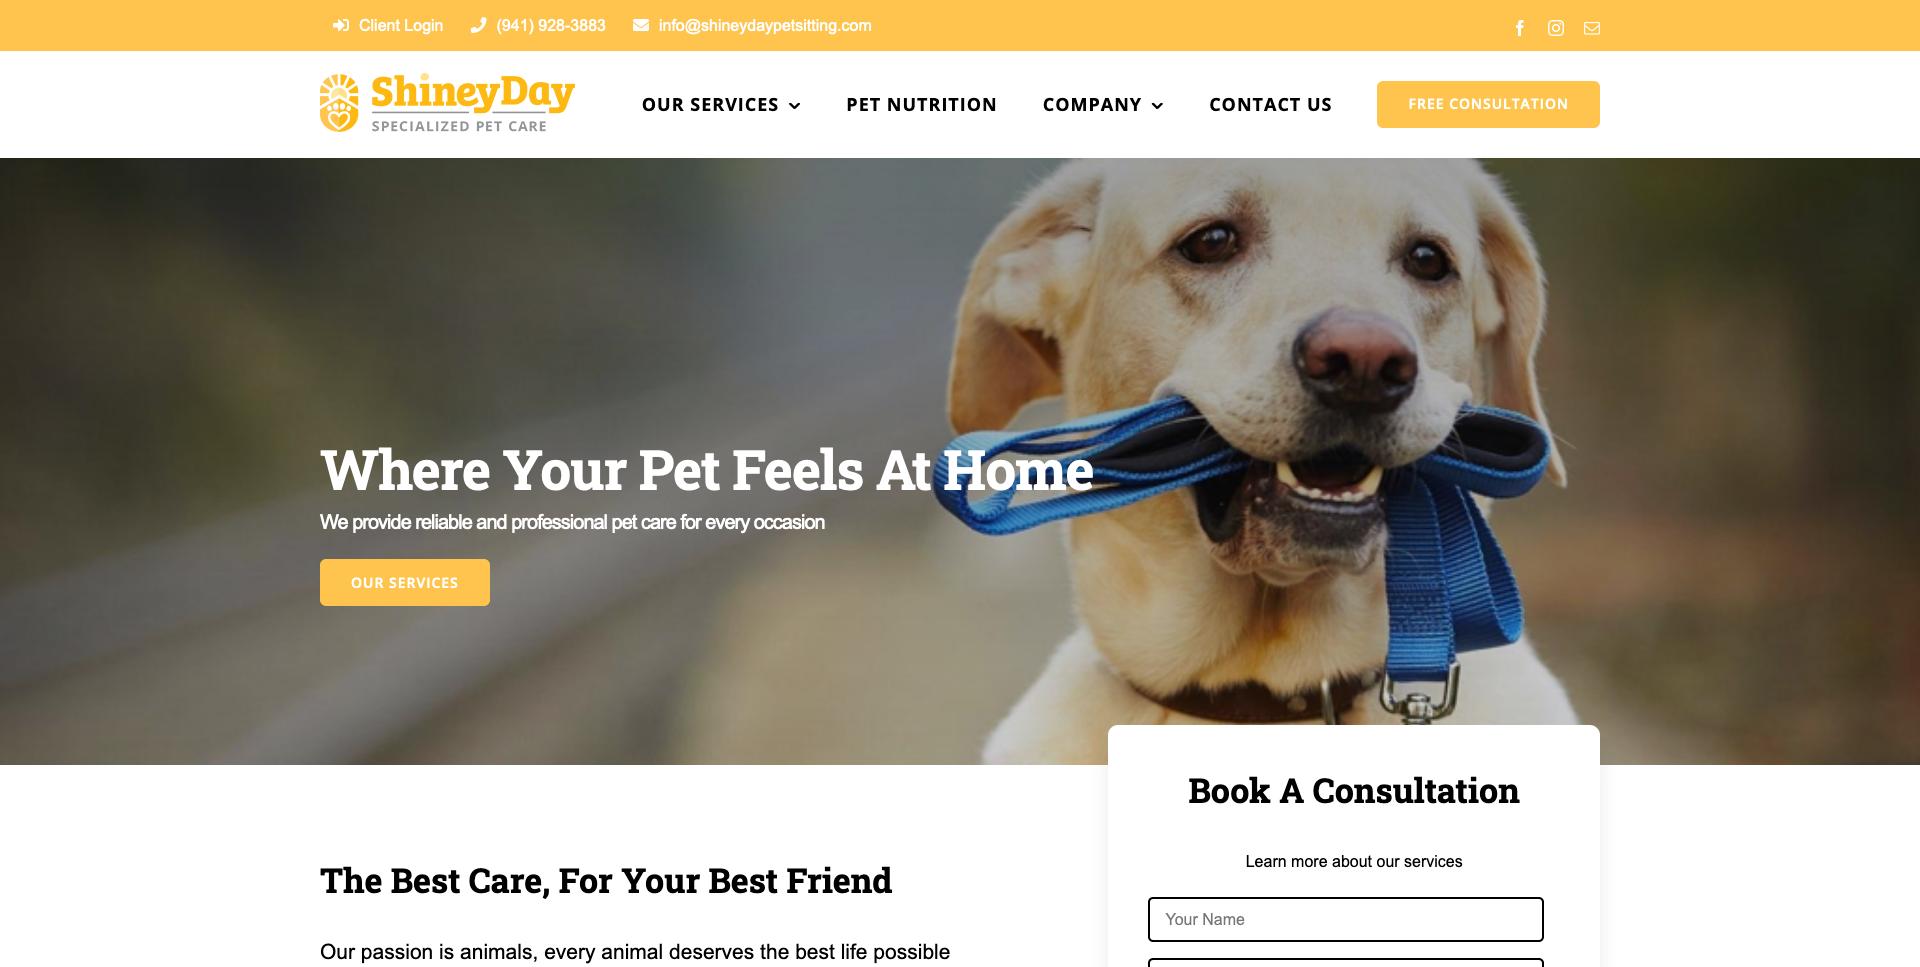 Fold - Shiney Day Pet Sitting - Professional Care - Sarasota, Venice, Braden_ - shineydaypetsitting.com